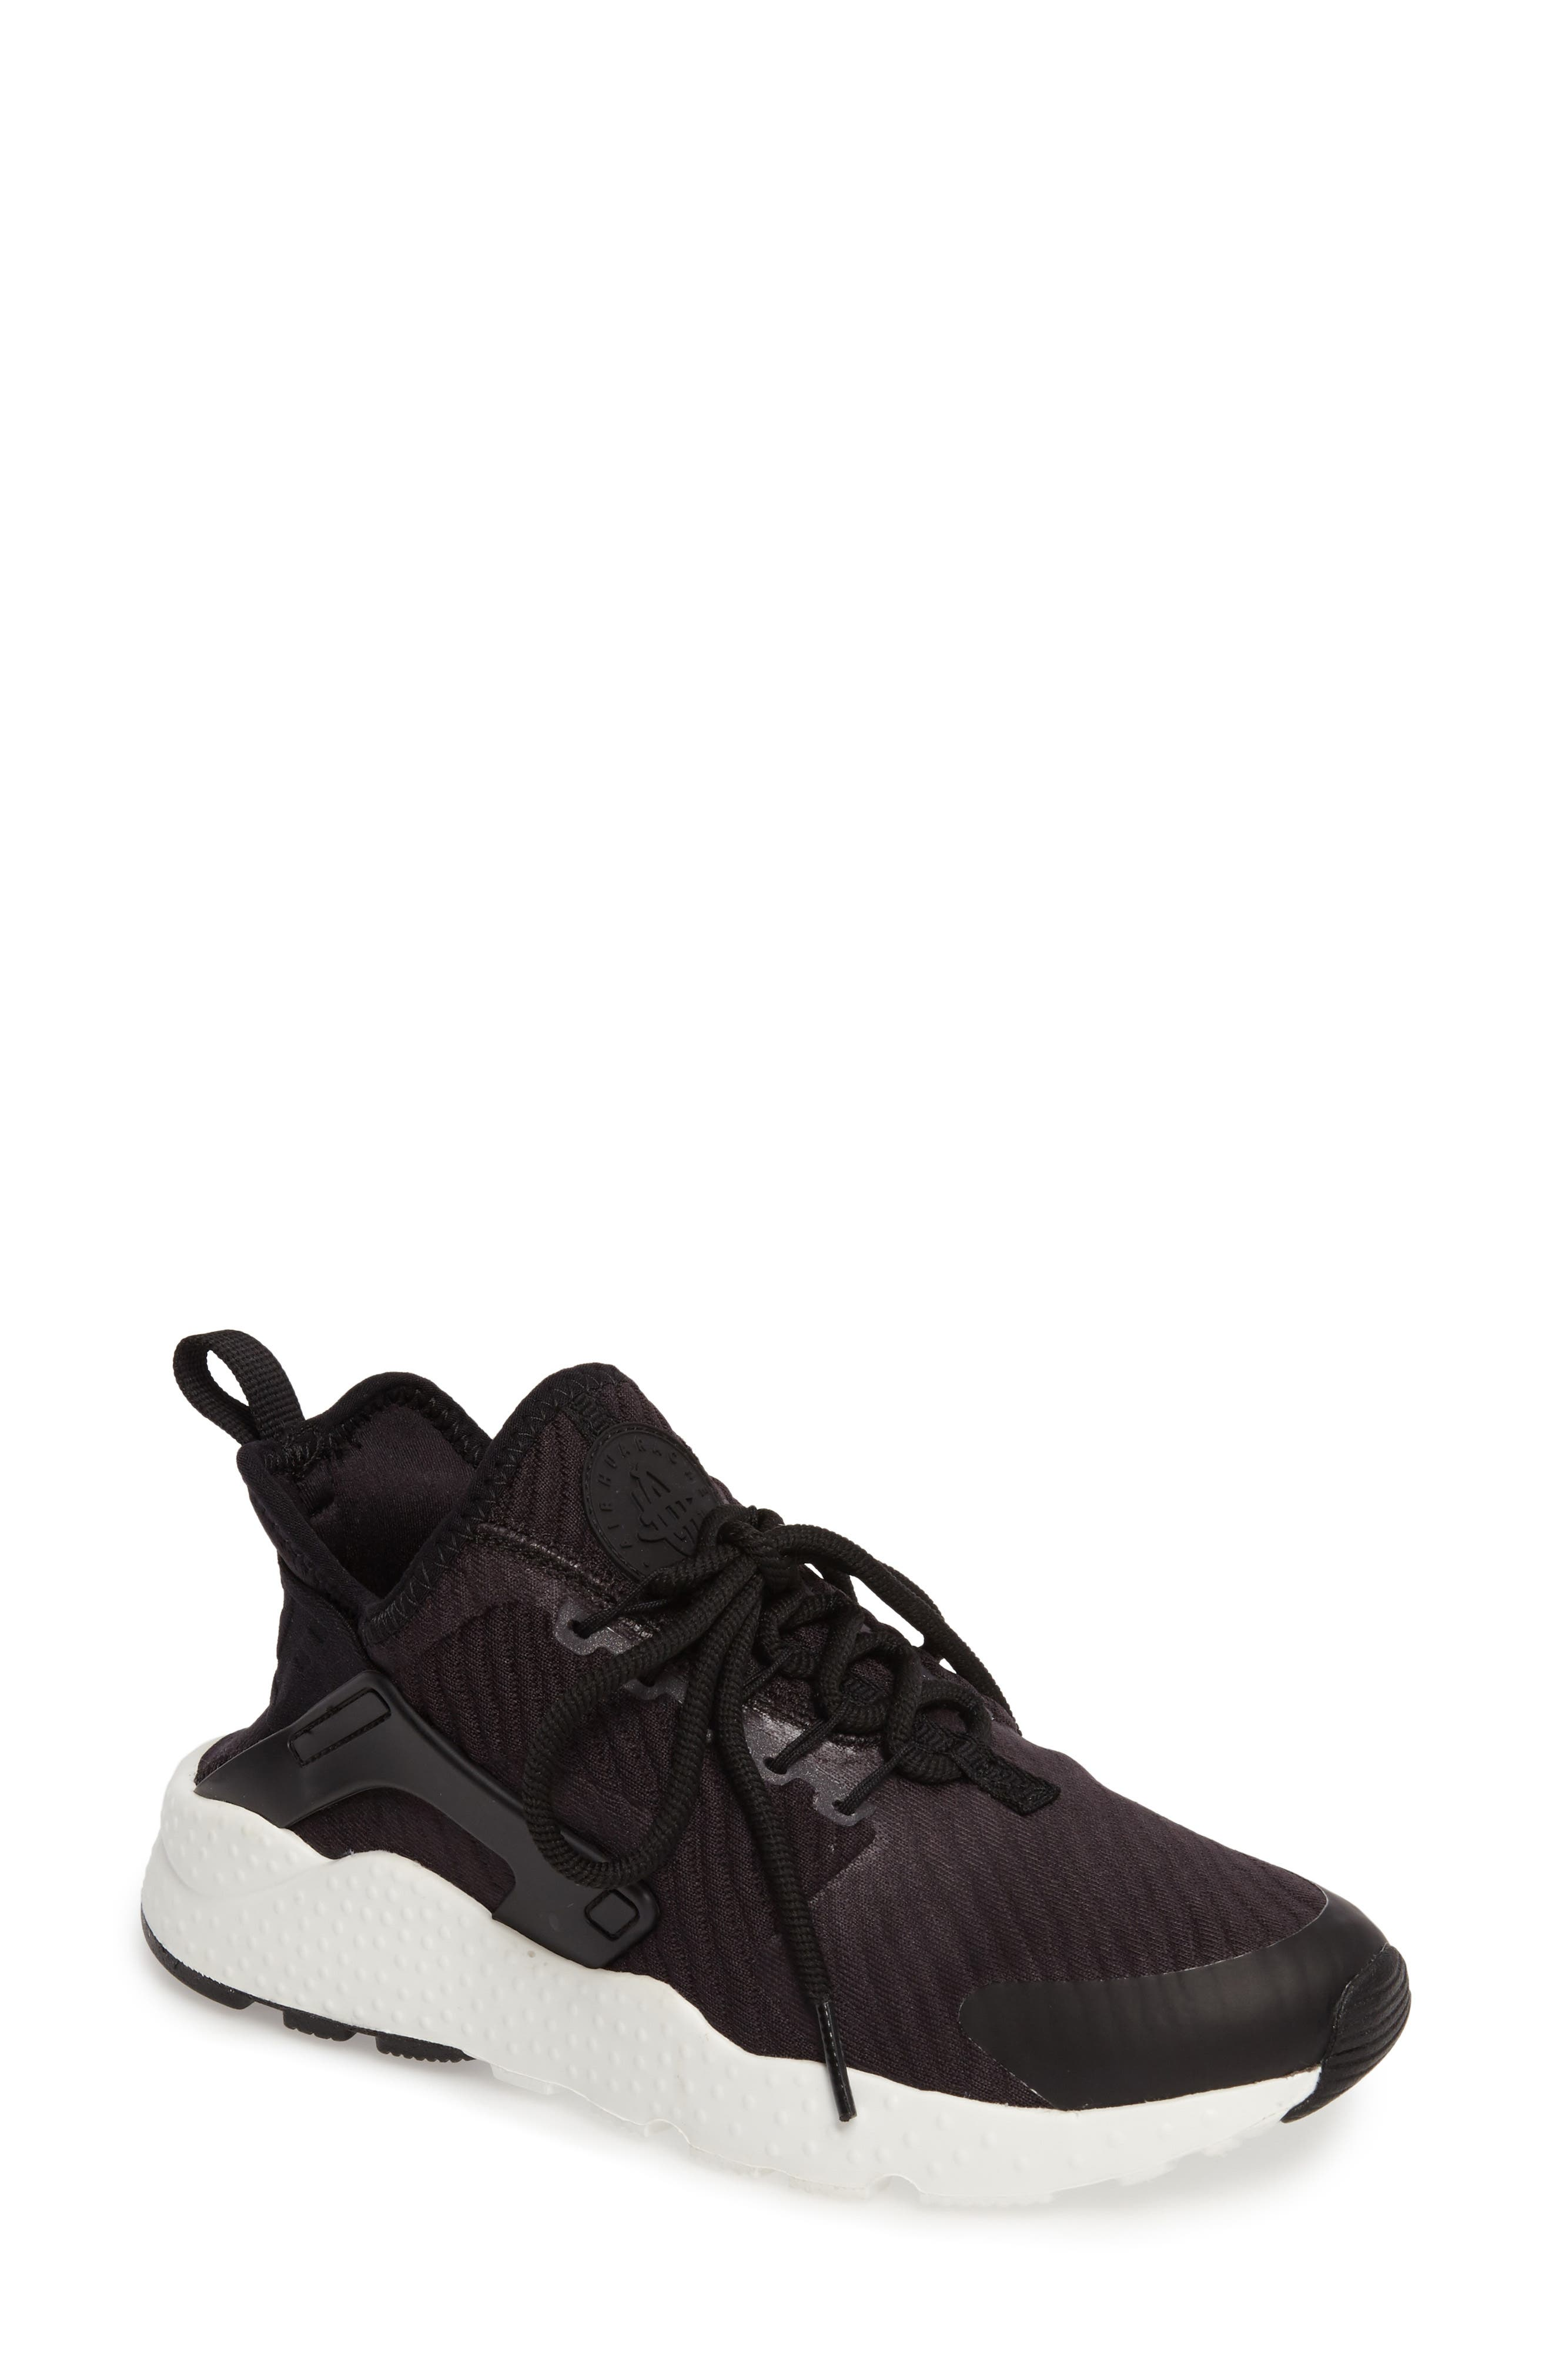 Alternate Image 1 Selected - Nike 'Air Huarache Run Ultra SE' Sneaker (Women)